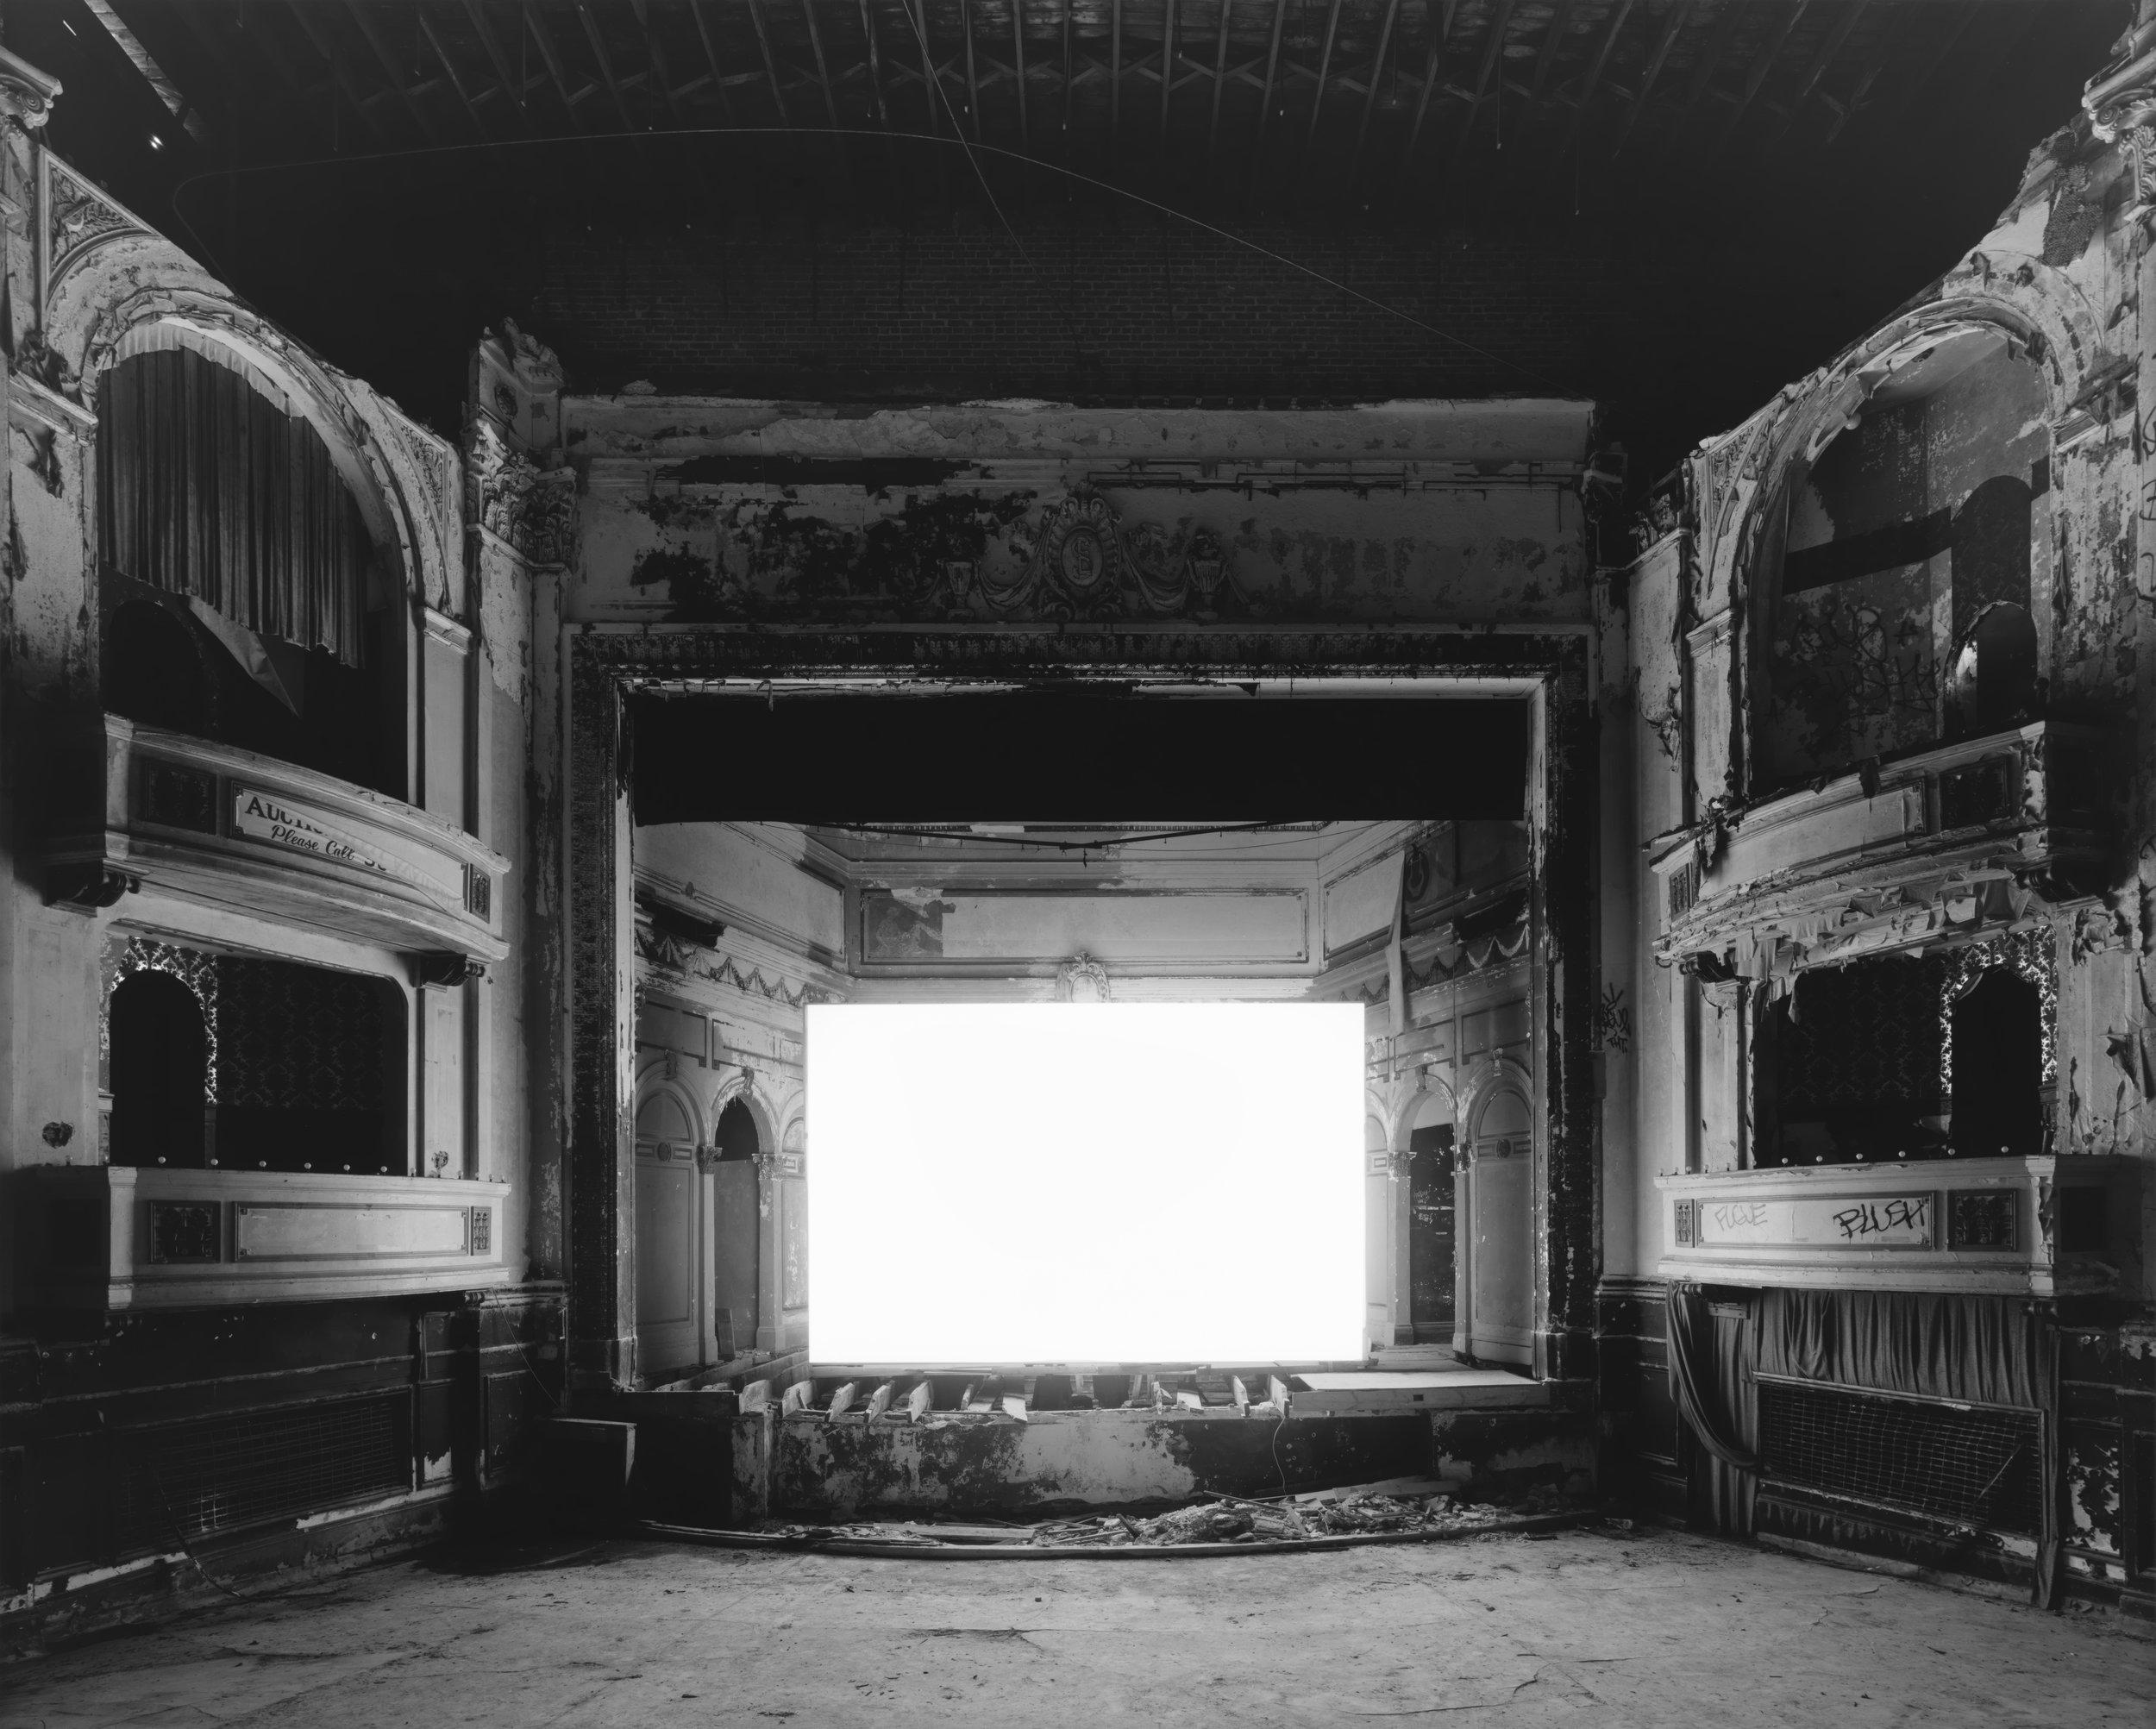 © Theaters by Hiroshi Sugimoto,Everett Square Theater, Boston, 2015